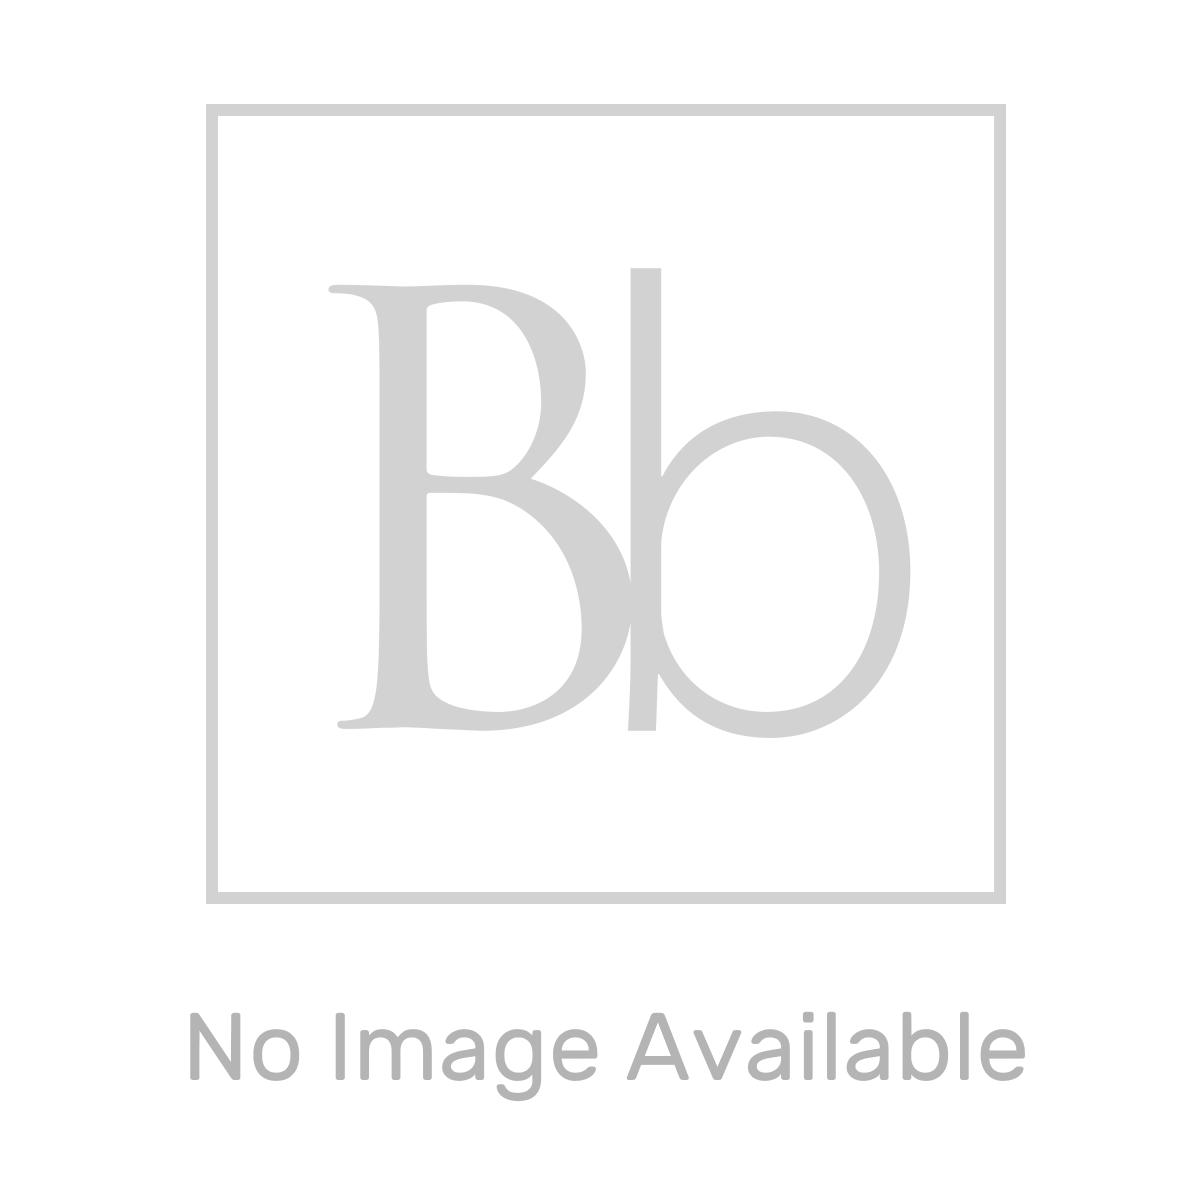 BTL Vema Maira Chrome Single Outlet Wall Mounted Shower Mixer